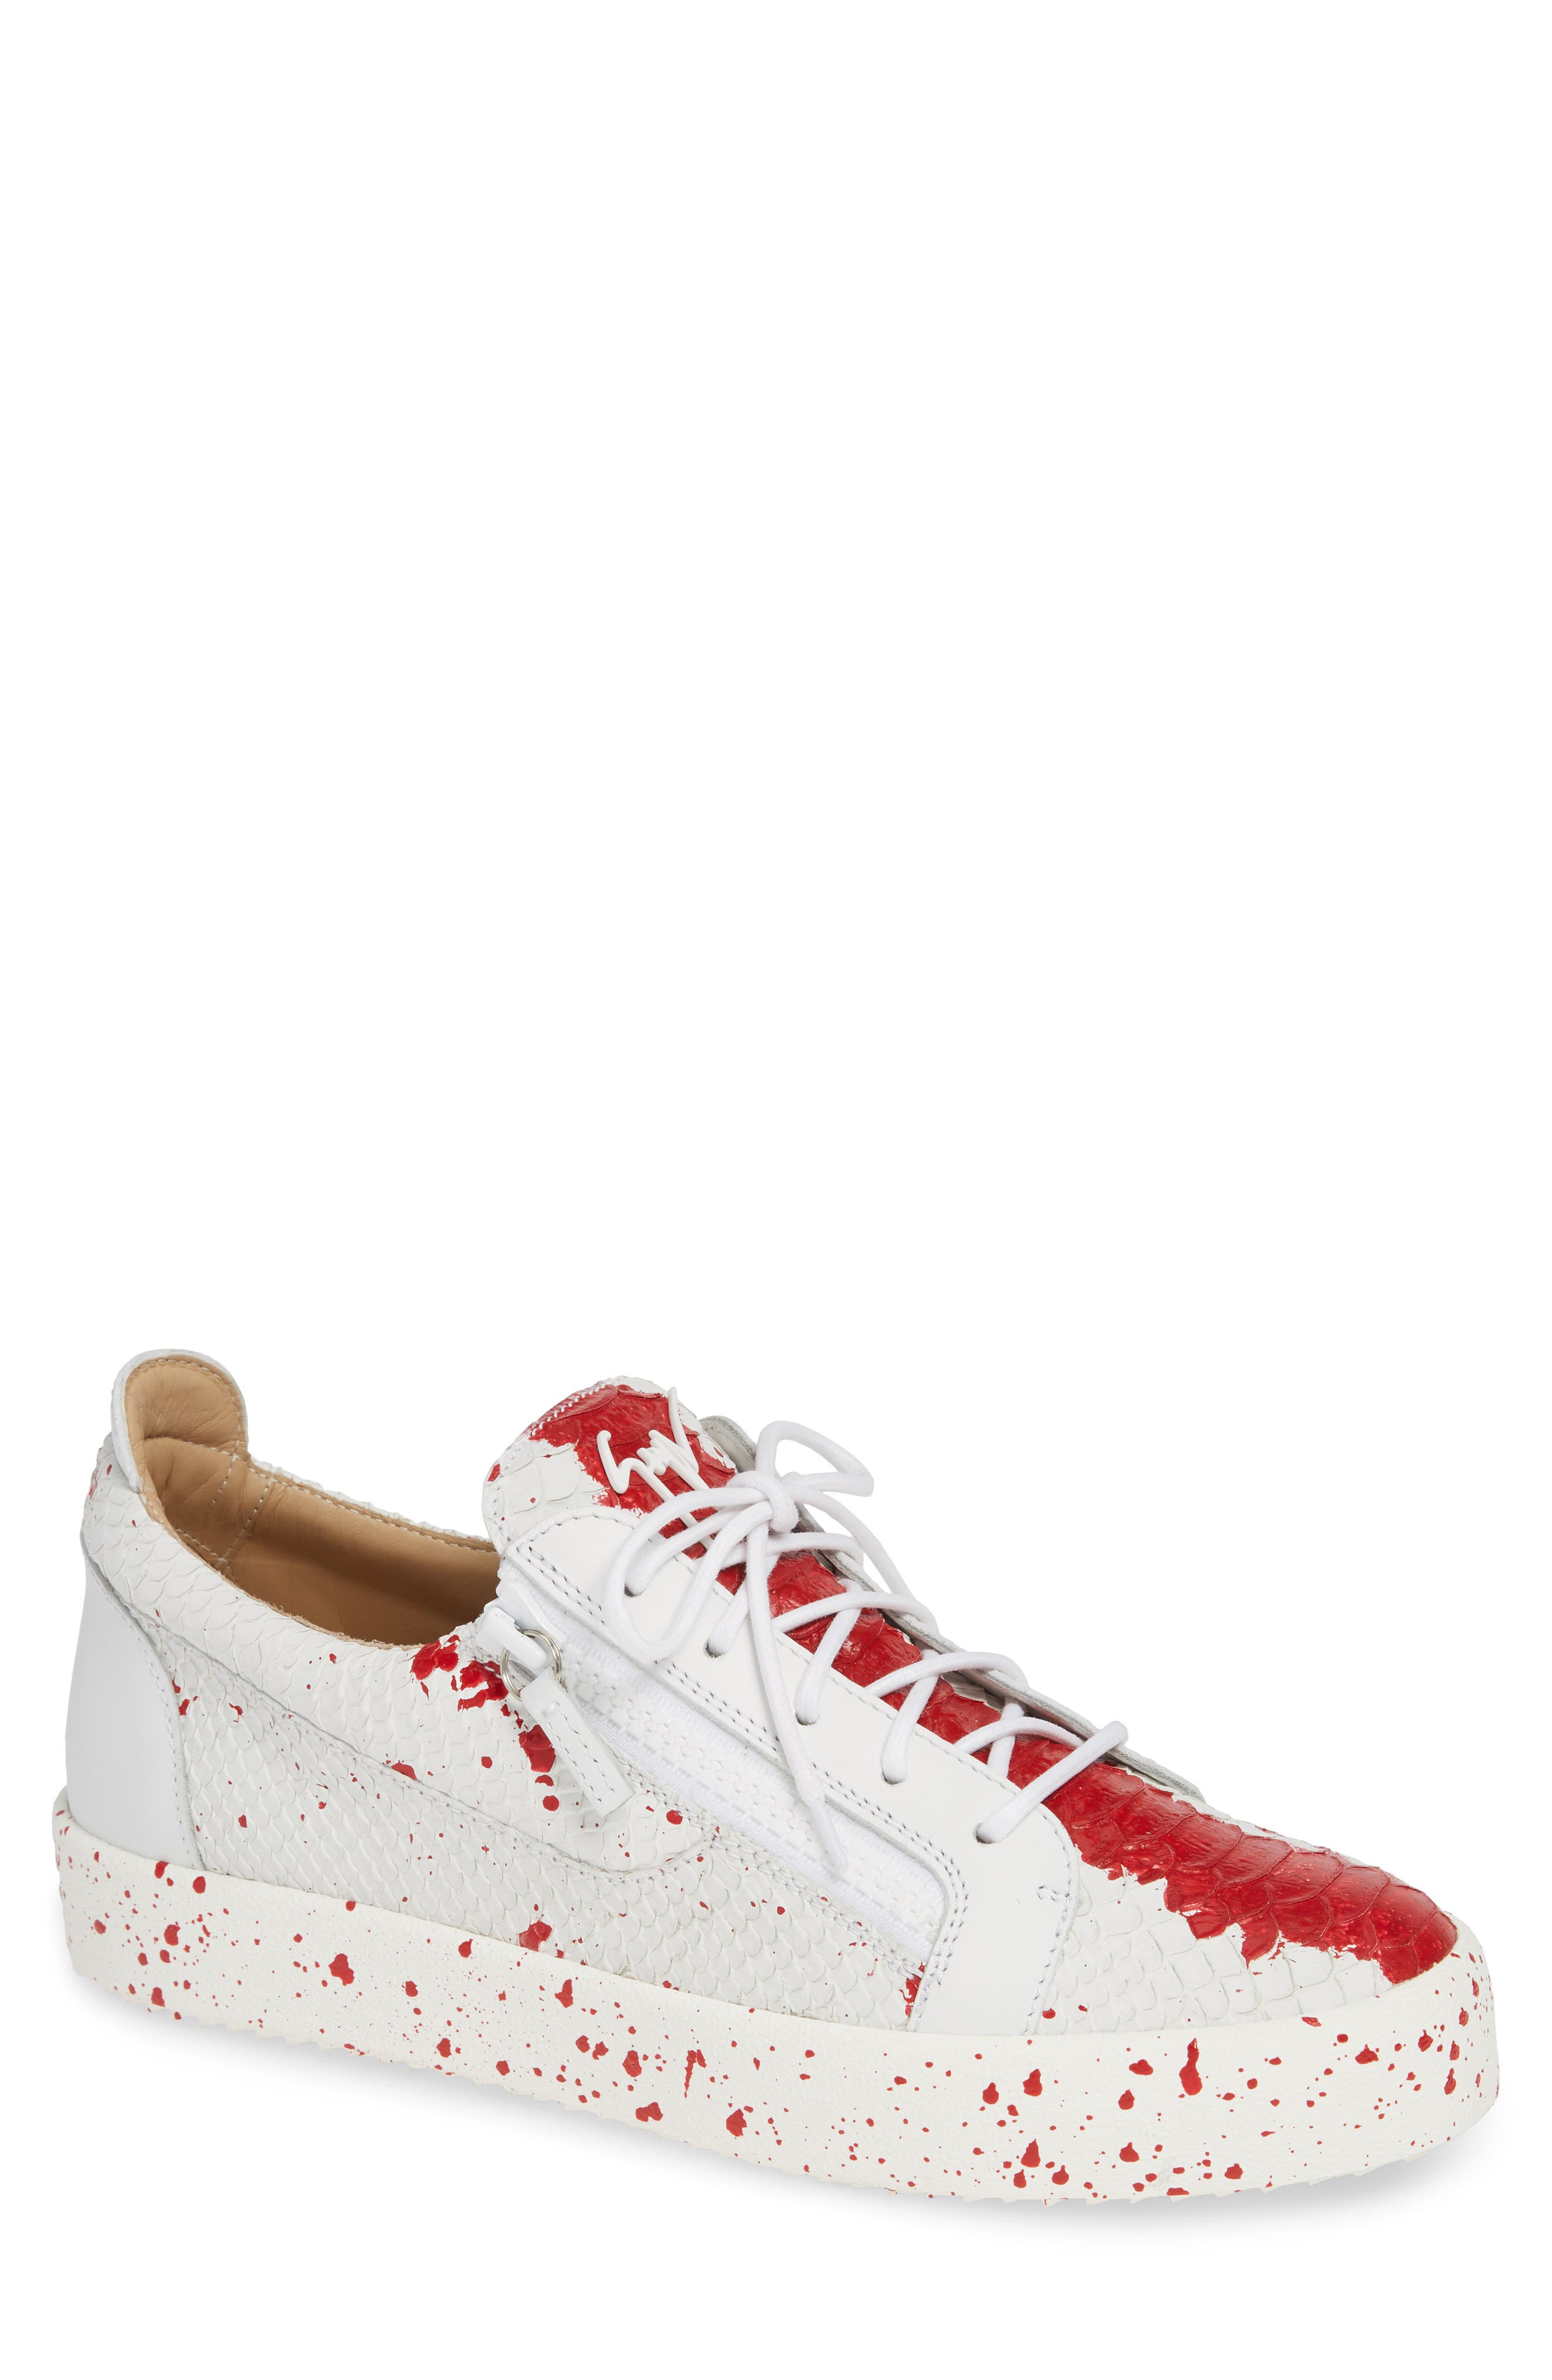 giuseppe zanotti women s shoes sneakers sandals nordstrom rh shop nordstrom com